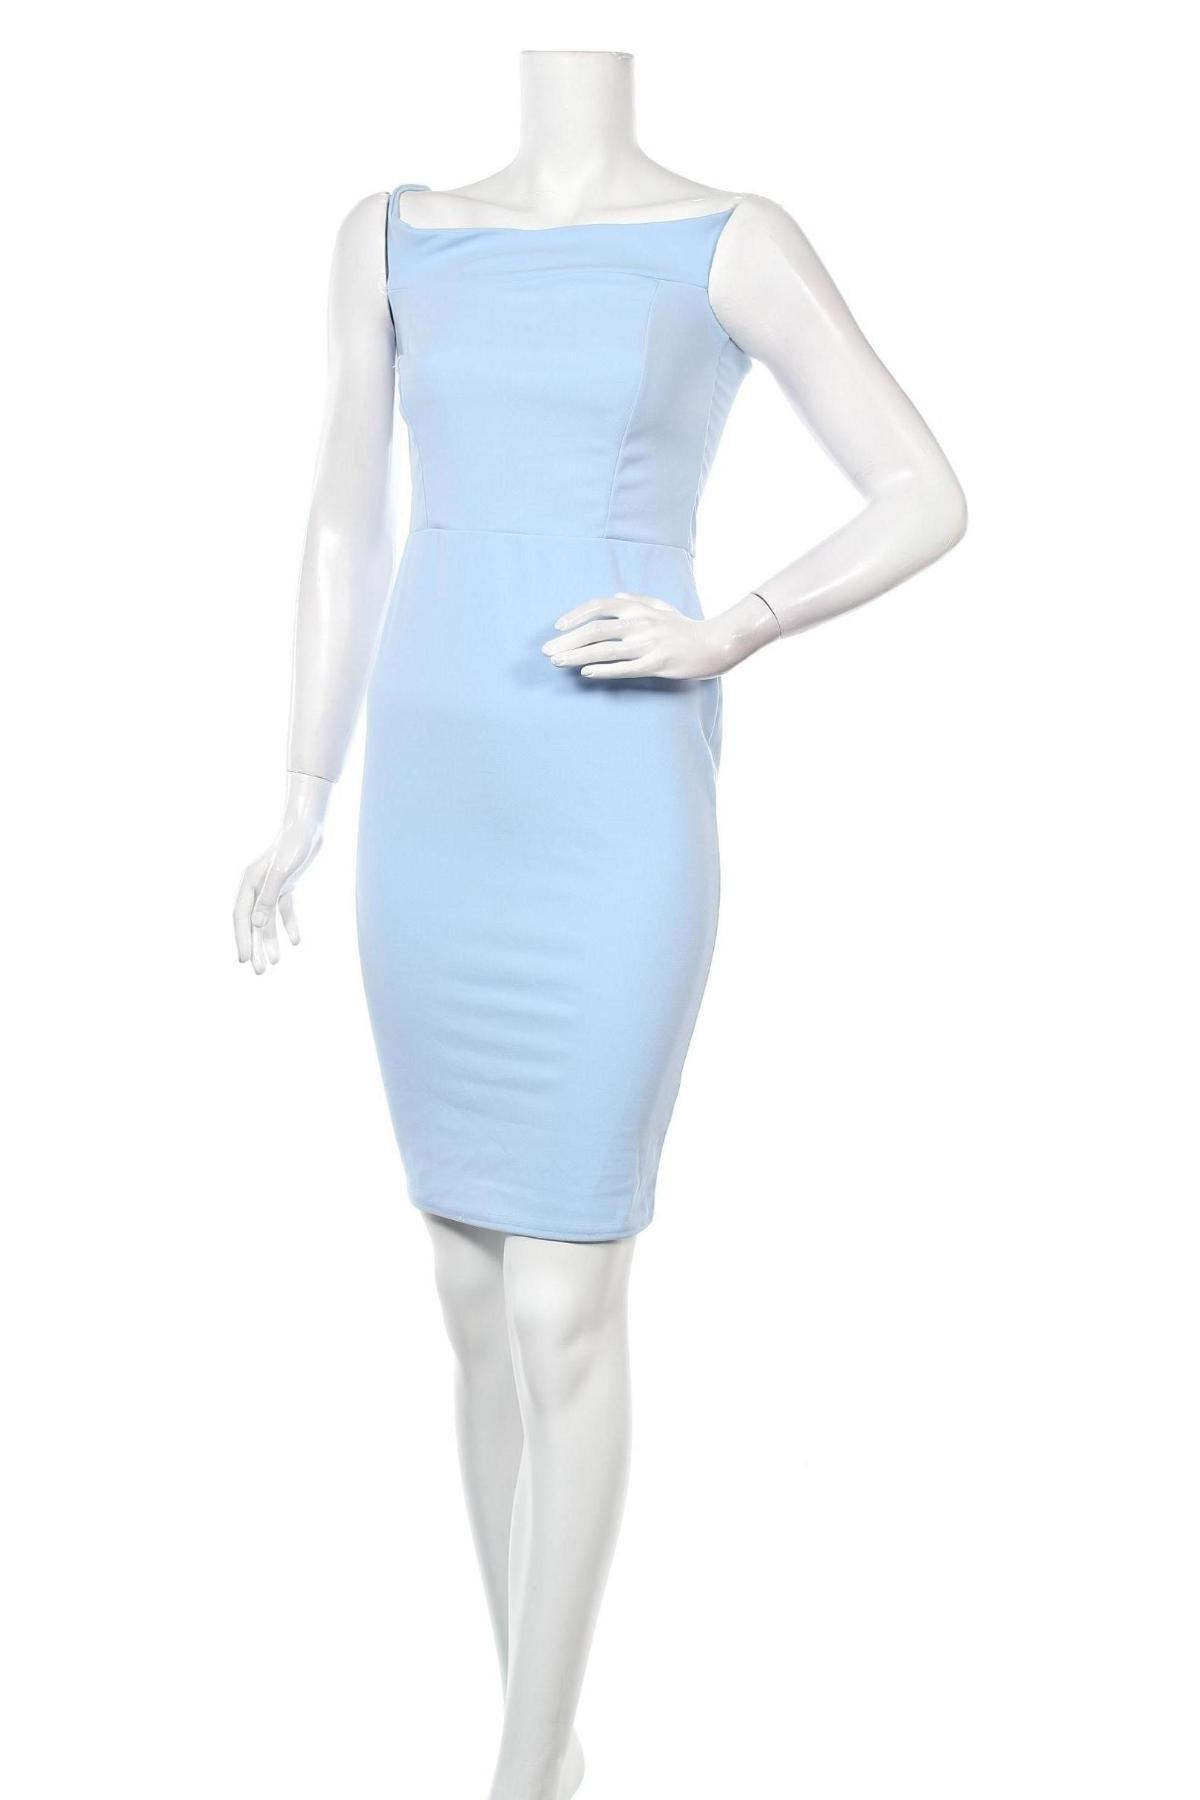 Рокля Missguided, Размер XS, Цвят Син, 95% полиестер, 5% еластан, Цена 57,00лв.